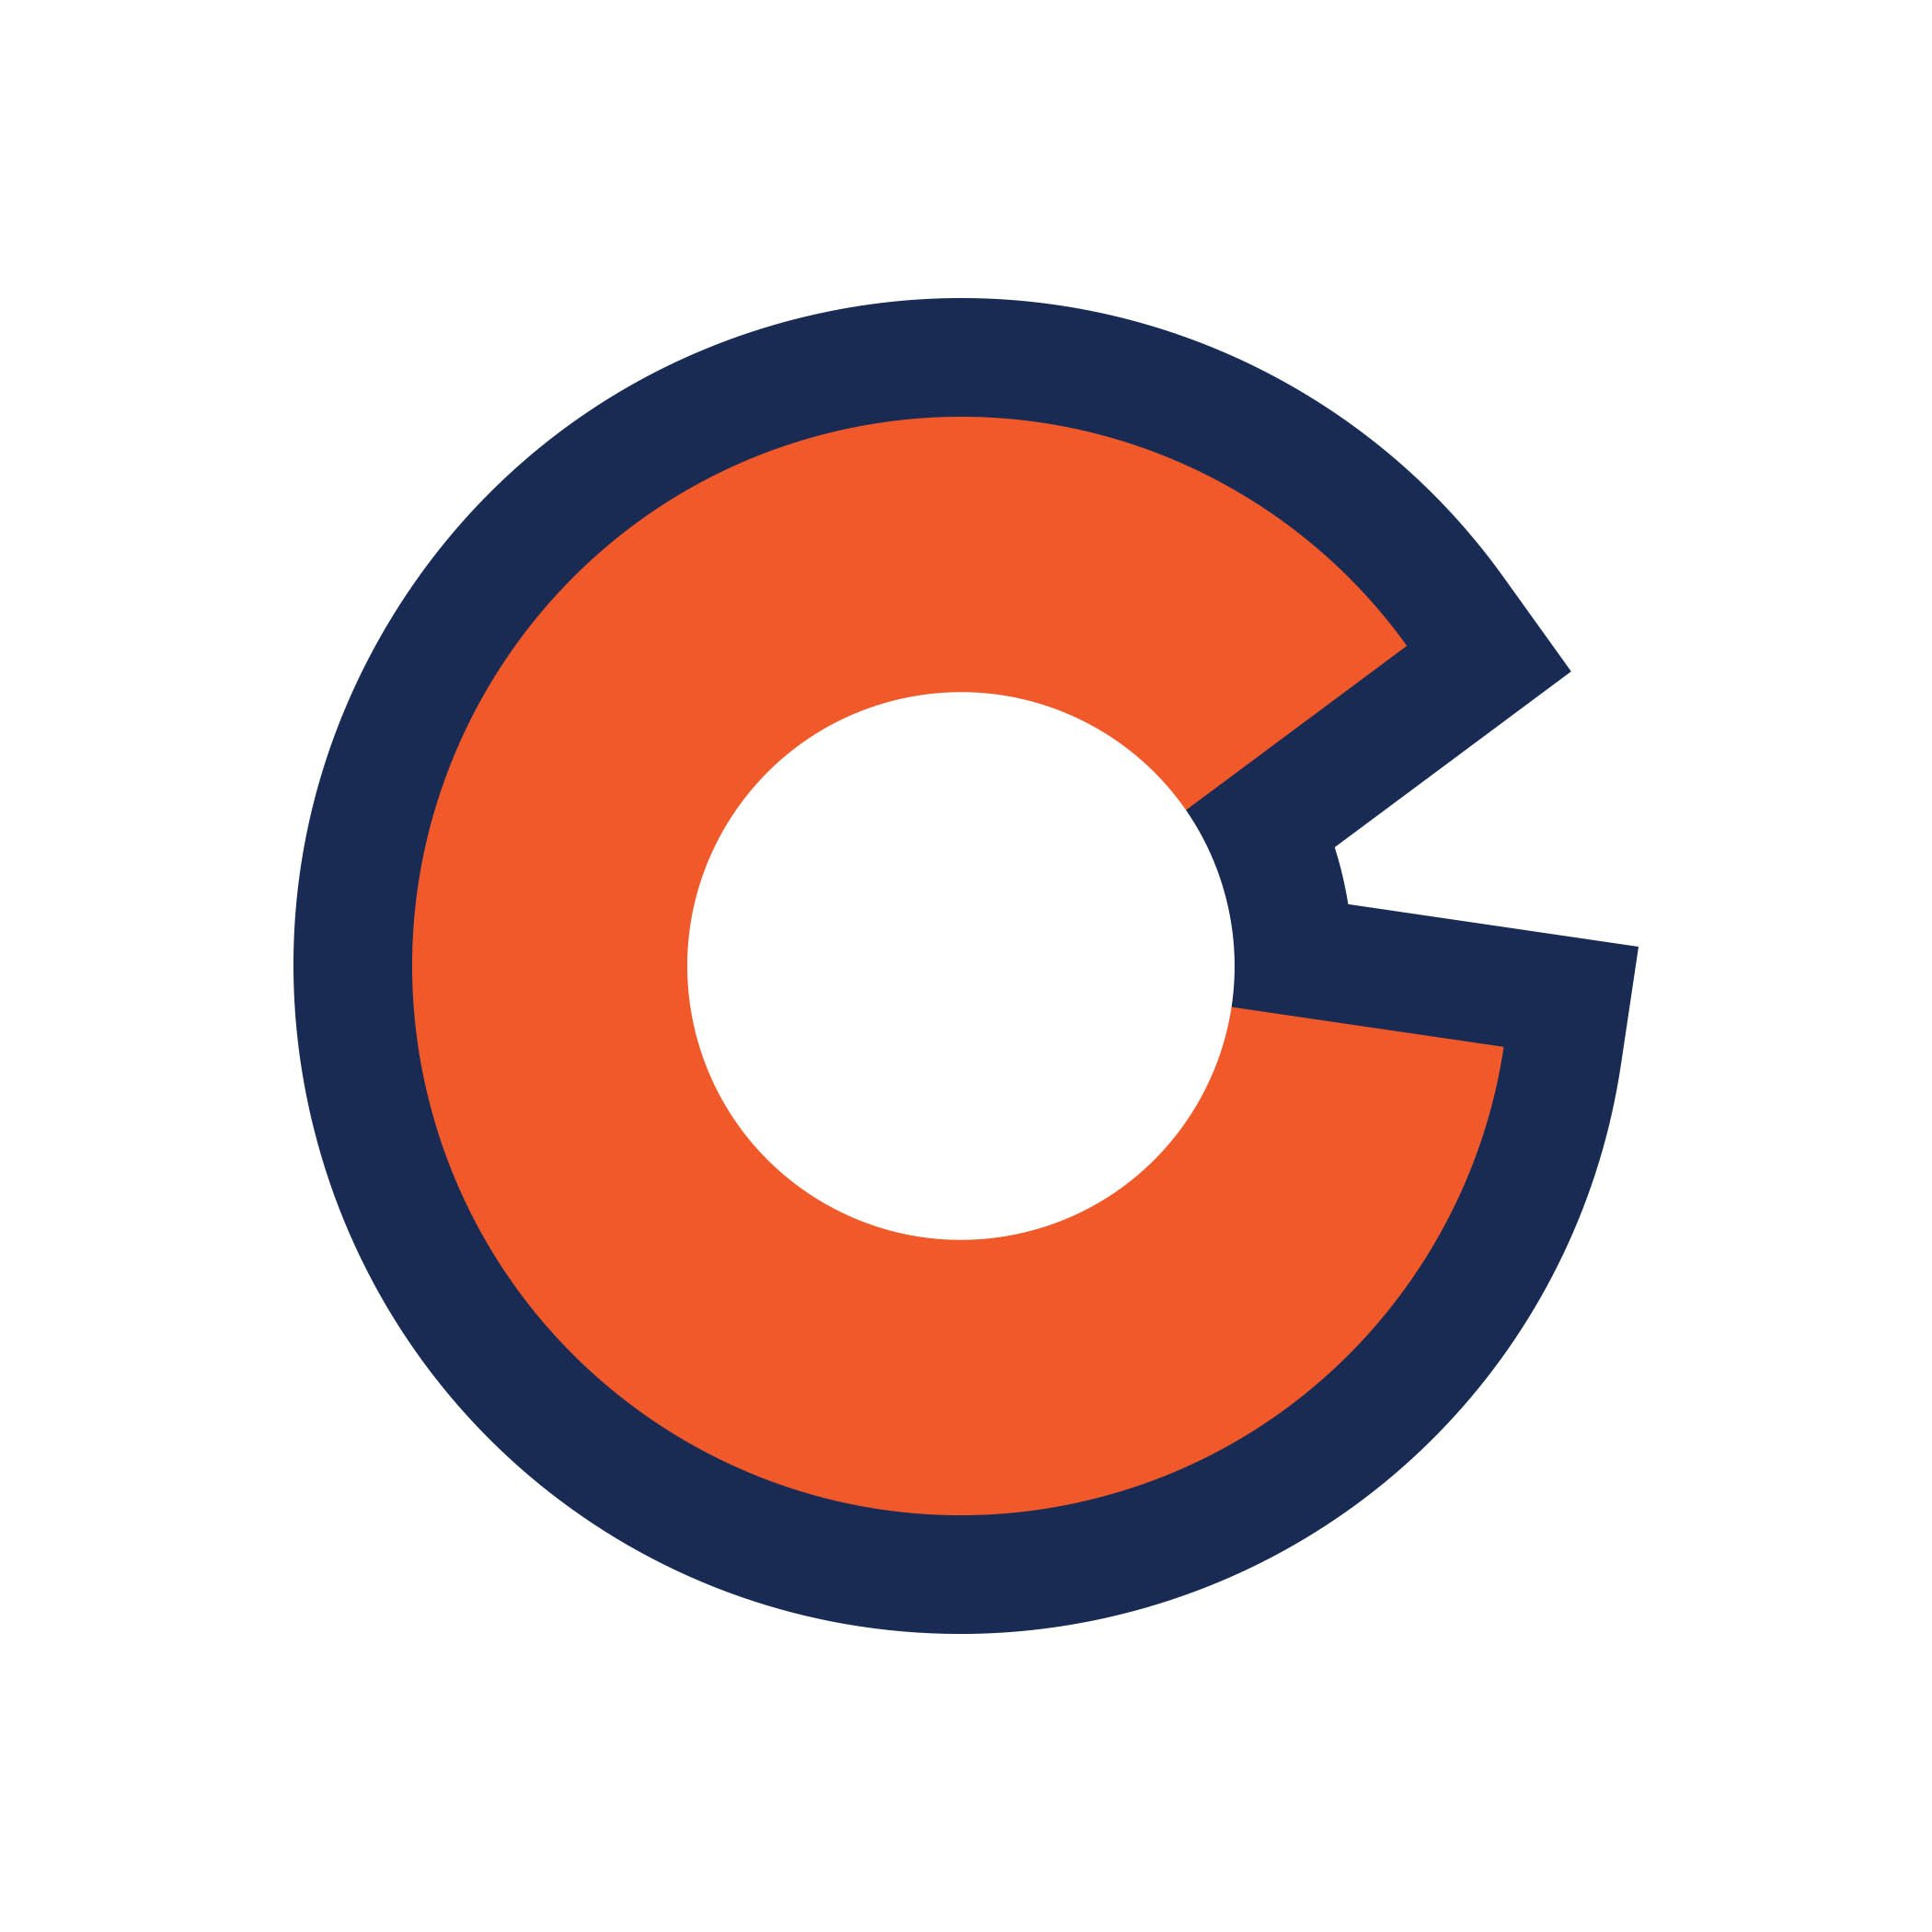 Colorado Big C Sticker.